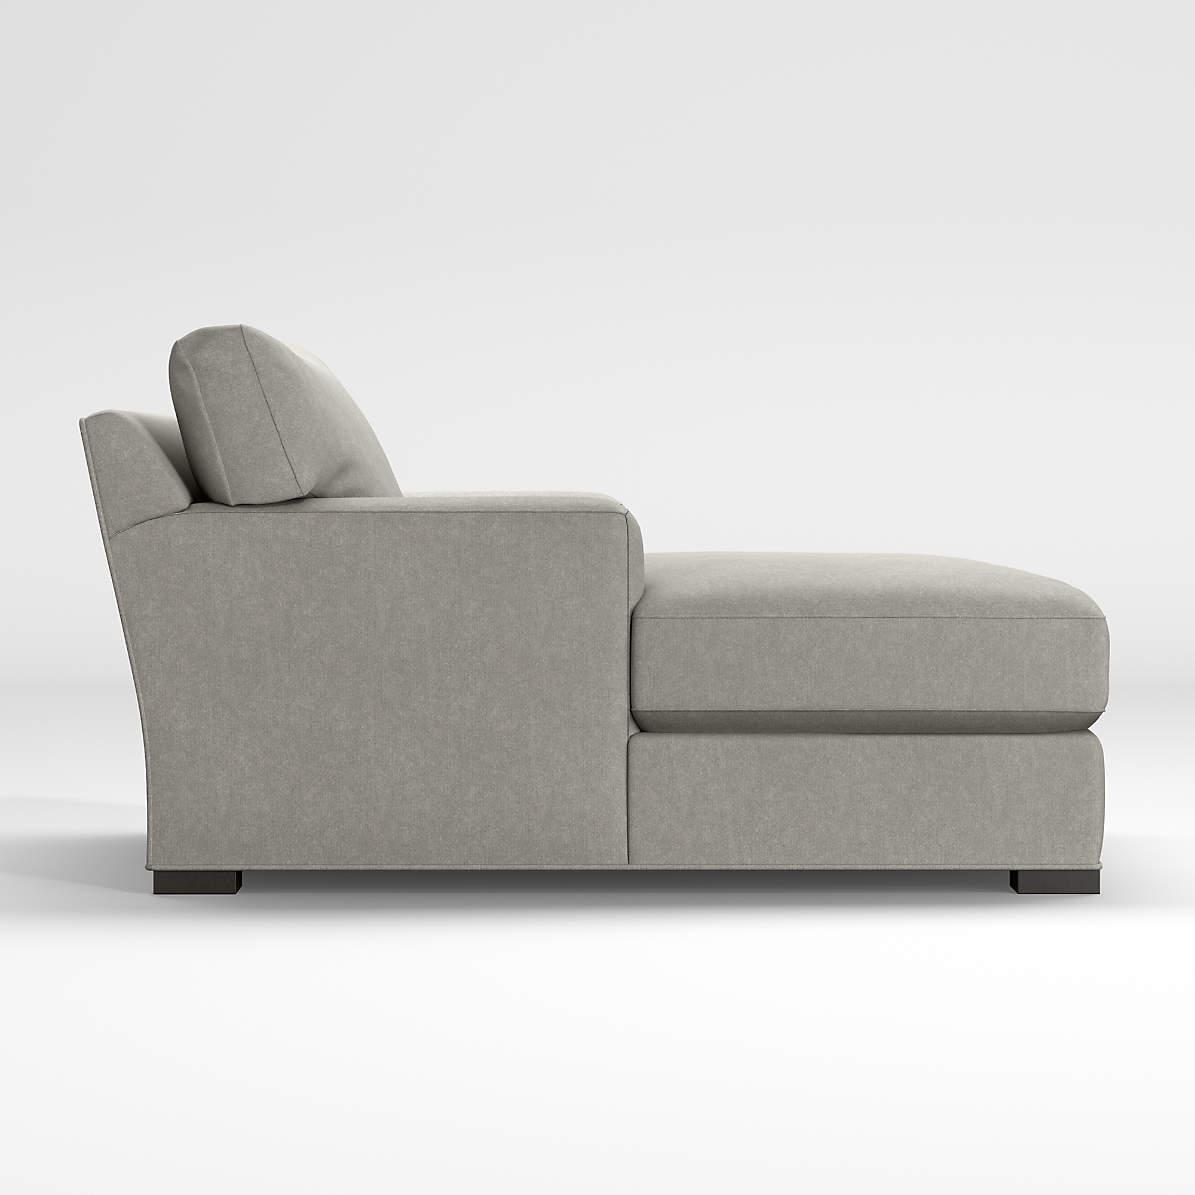 axis ii chaise lounge